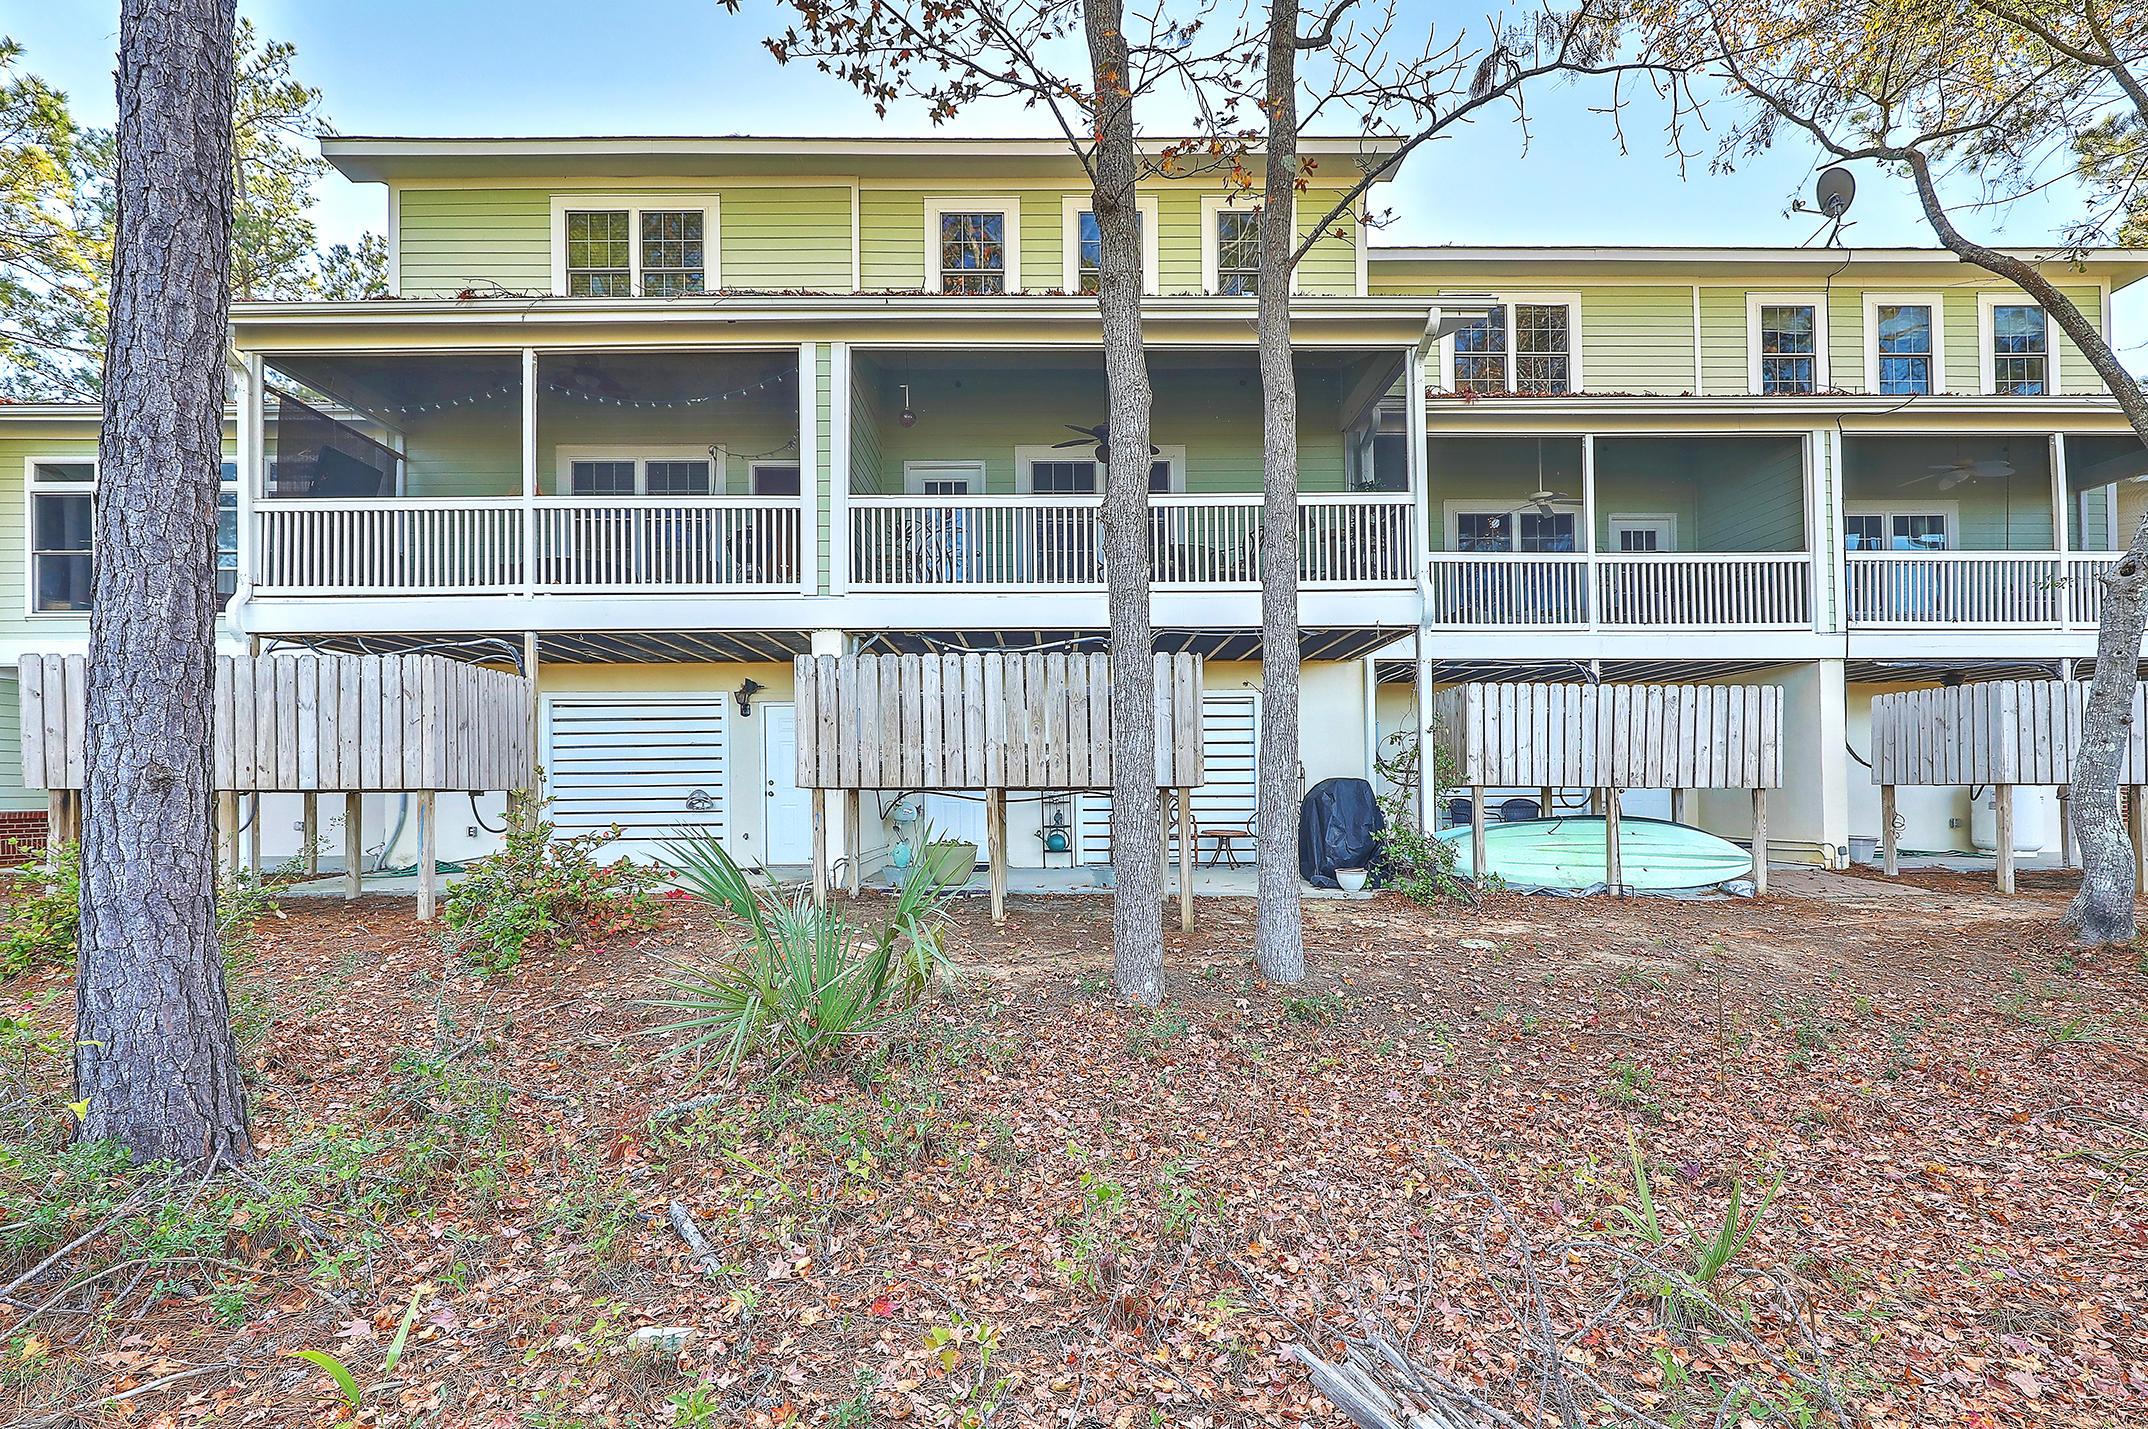 Etiwan Pointe Homes For Sale - 124 Winding Creek, Mount Pleasant, SC - 3